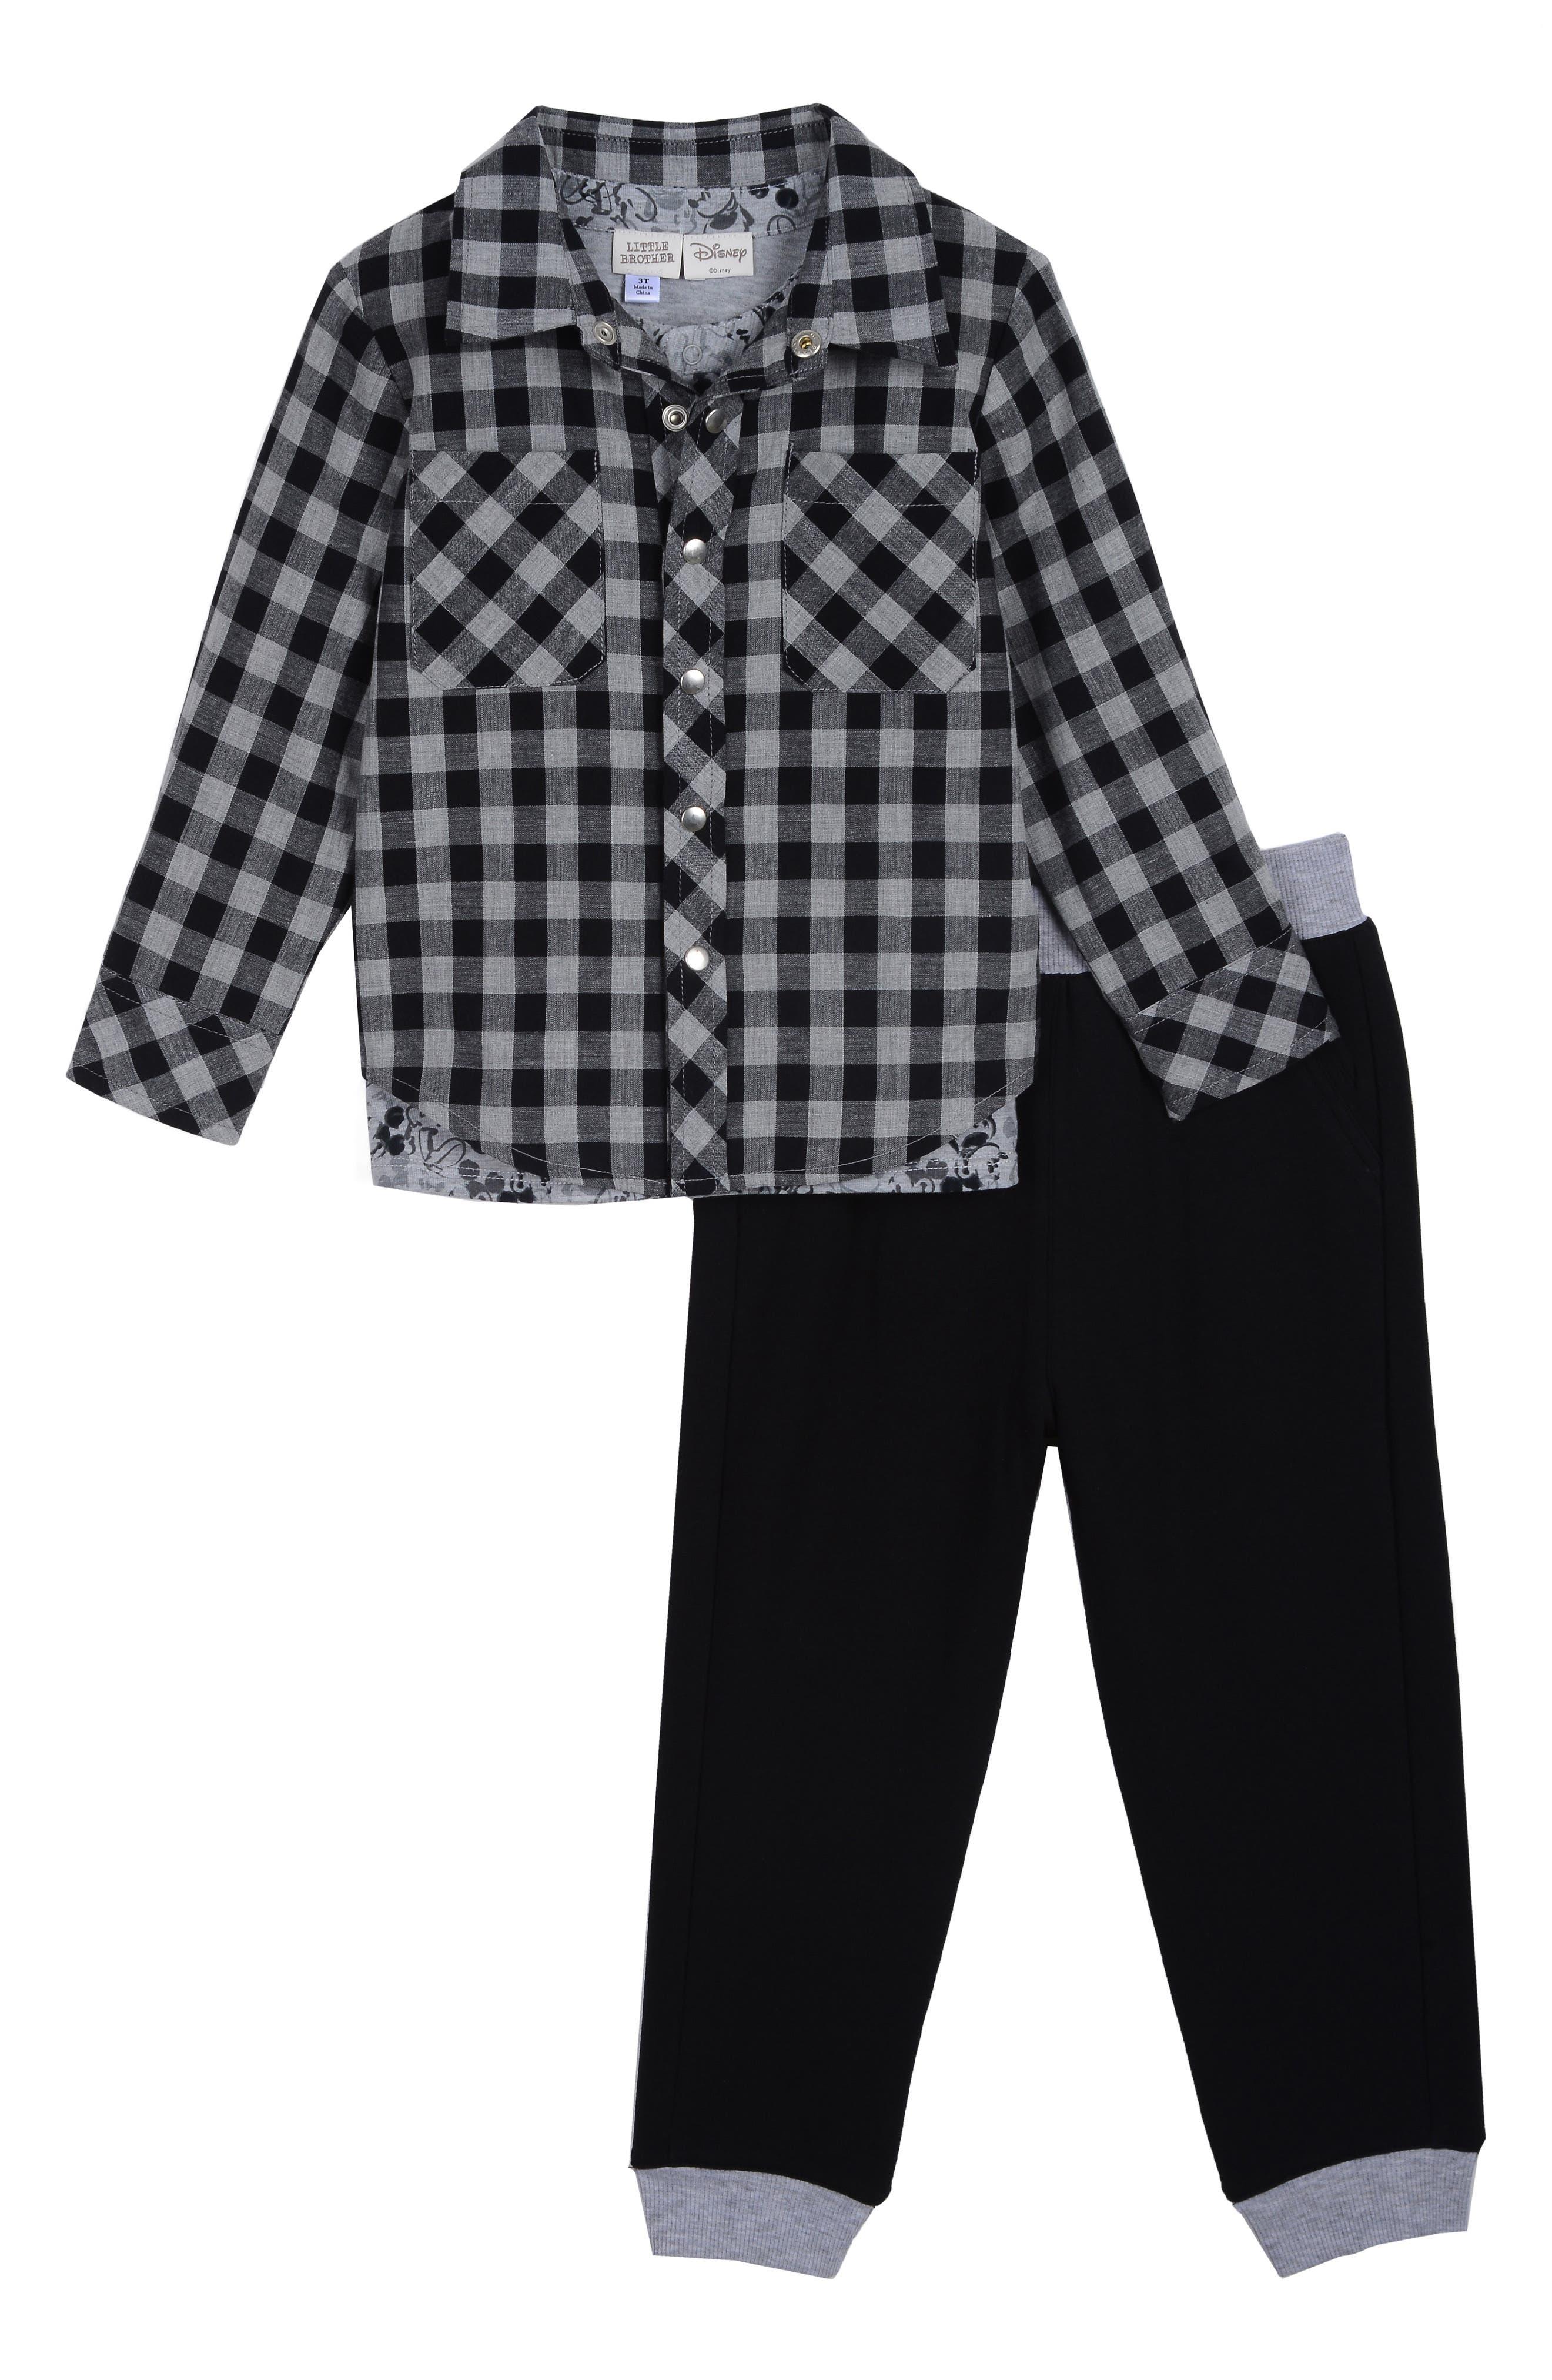 x Disney Plaid Shirt, T-Shirt & Pants Set,                             Main thumbnail 1, color,                             BLACK / GREY